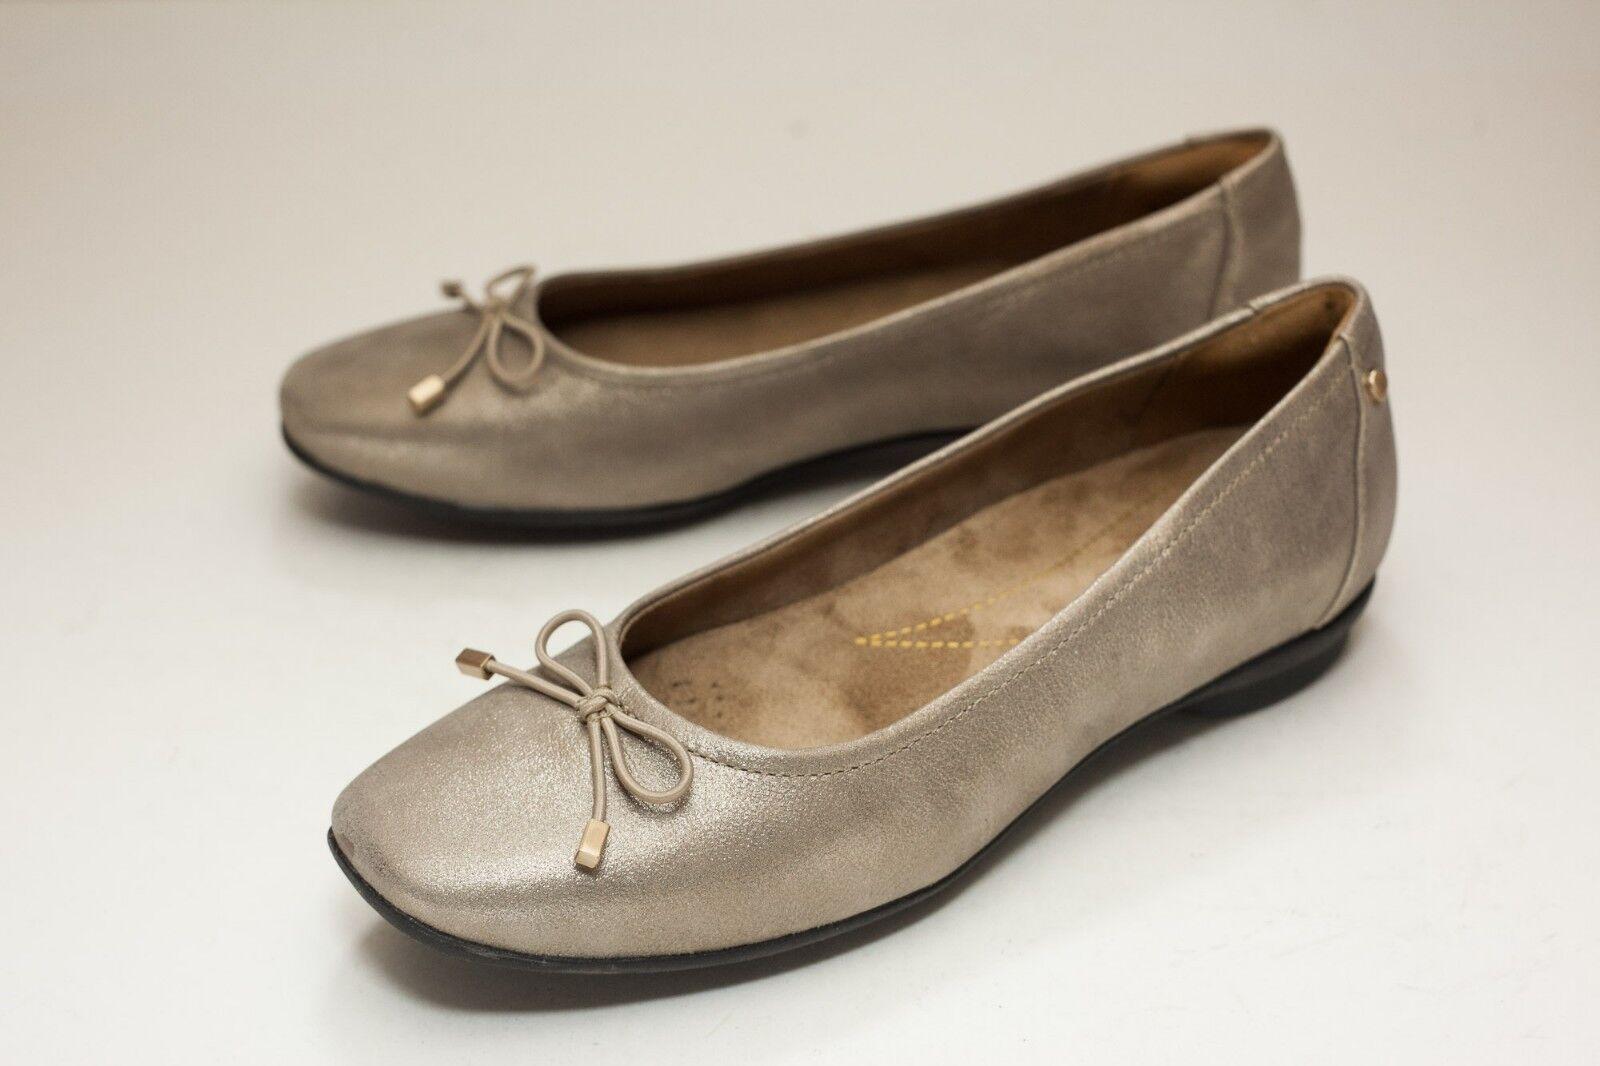 052ac9c63d1 Clarks Candra Ballet Flats Women s Slip On 6.5 Bronze nuuxgz3129-Women s  Comfort Shoes